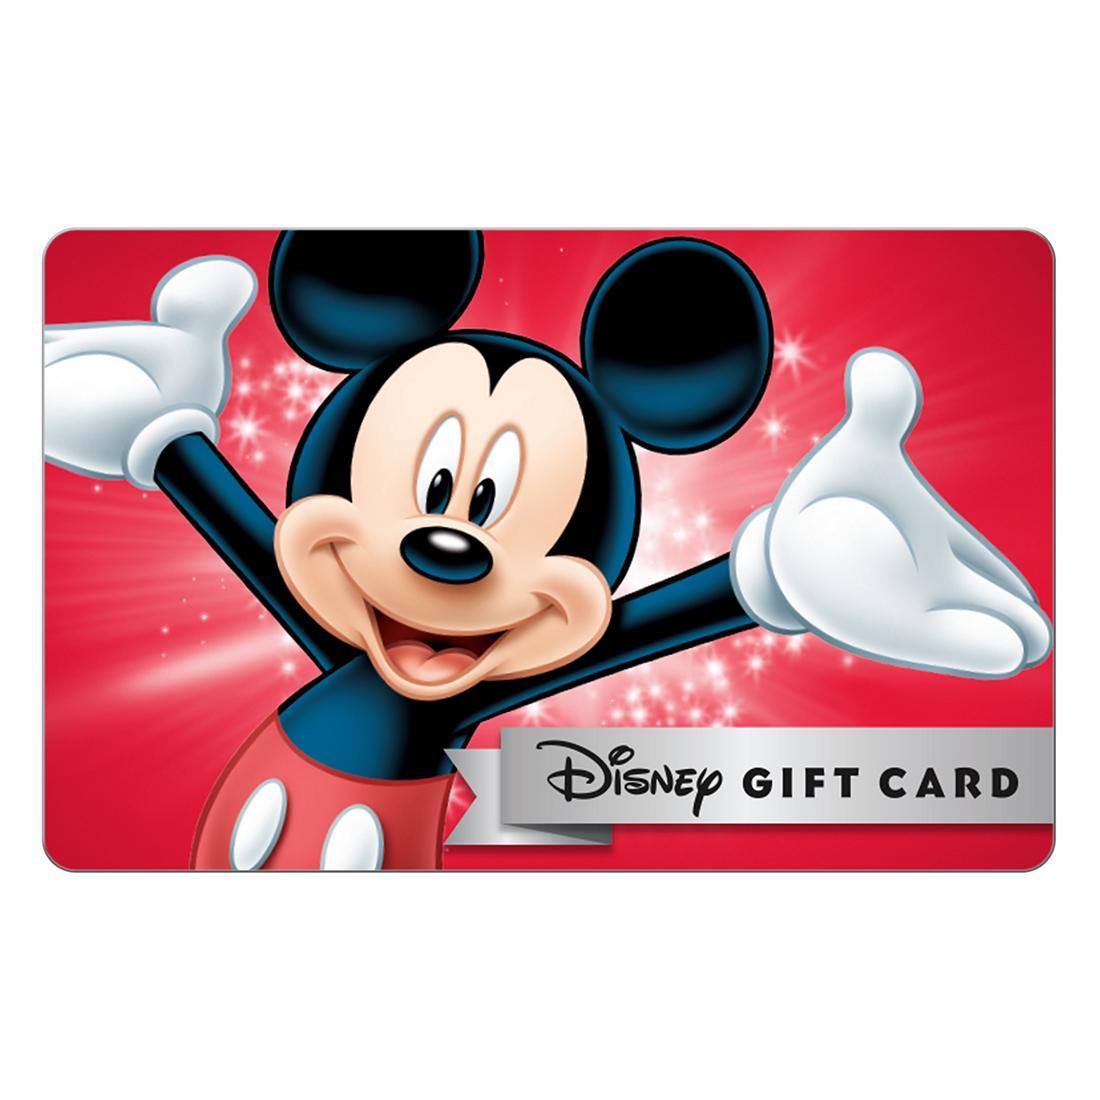 Disney gift cards now 6% off at BJs